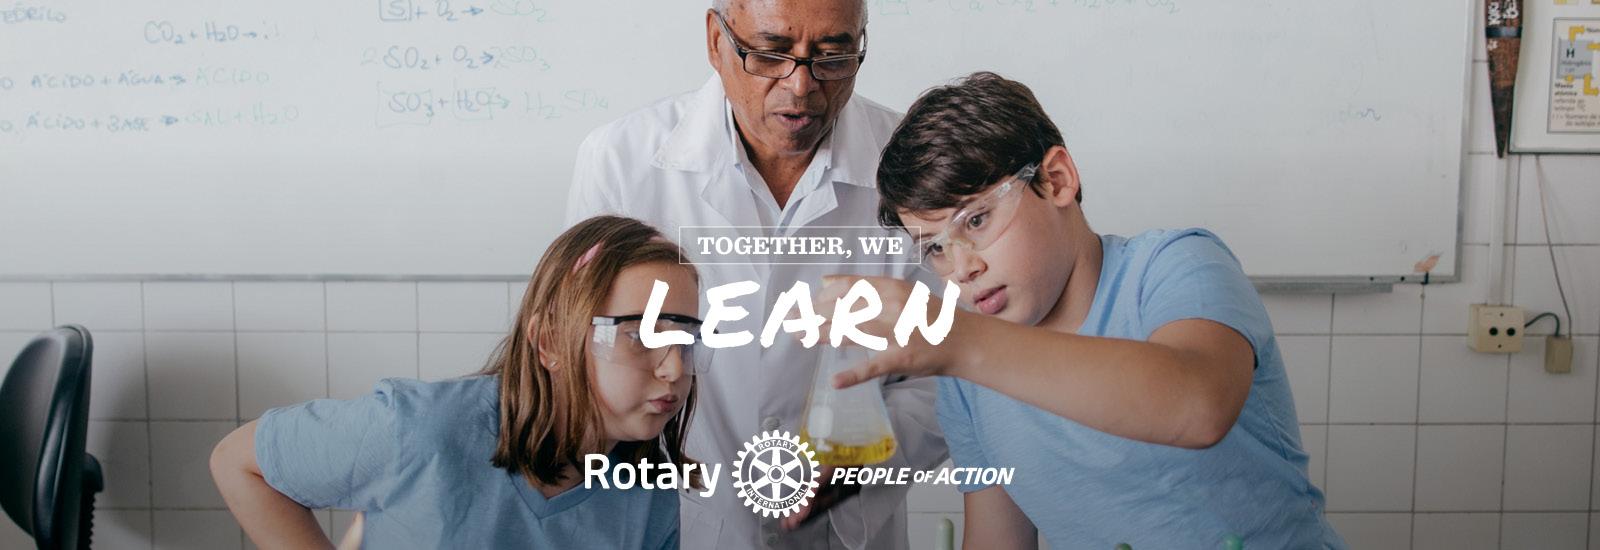 20396_Together_We_Learn_Digital_horizontal_banner_ORIGINAL.jpg